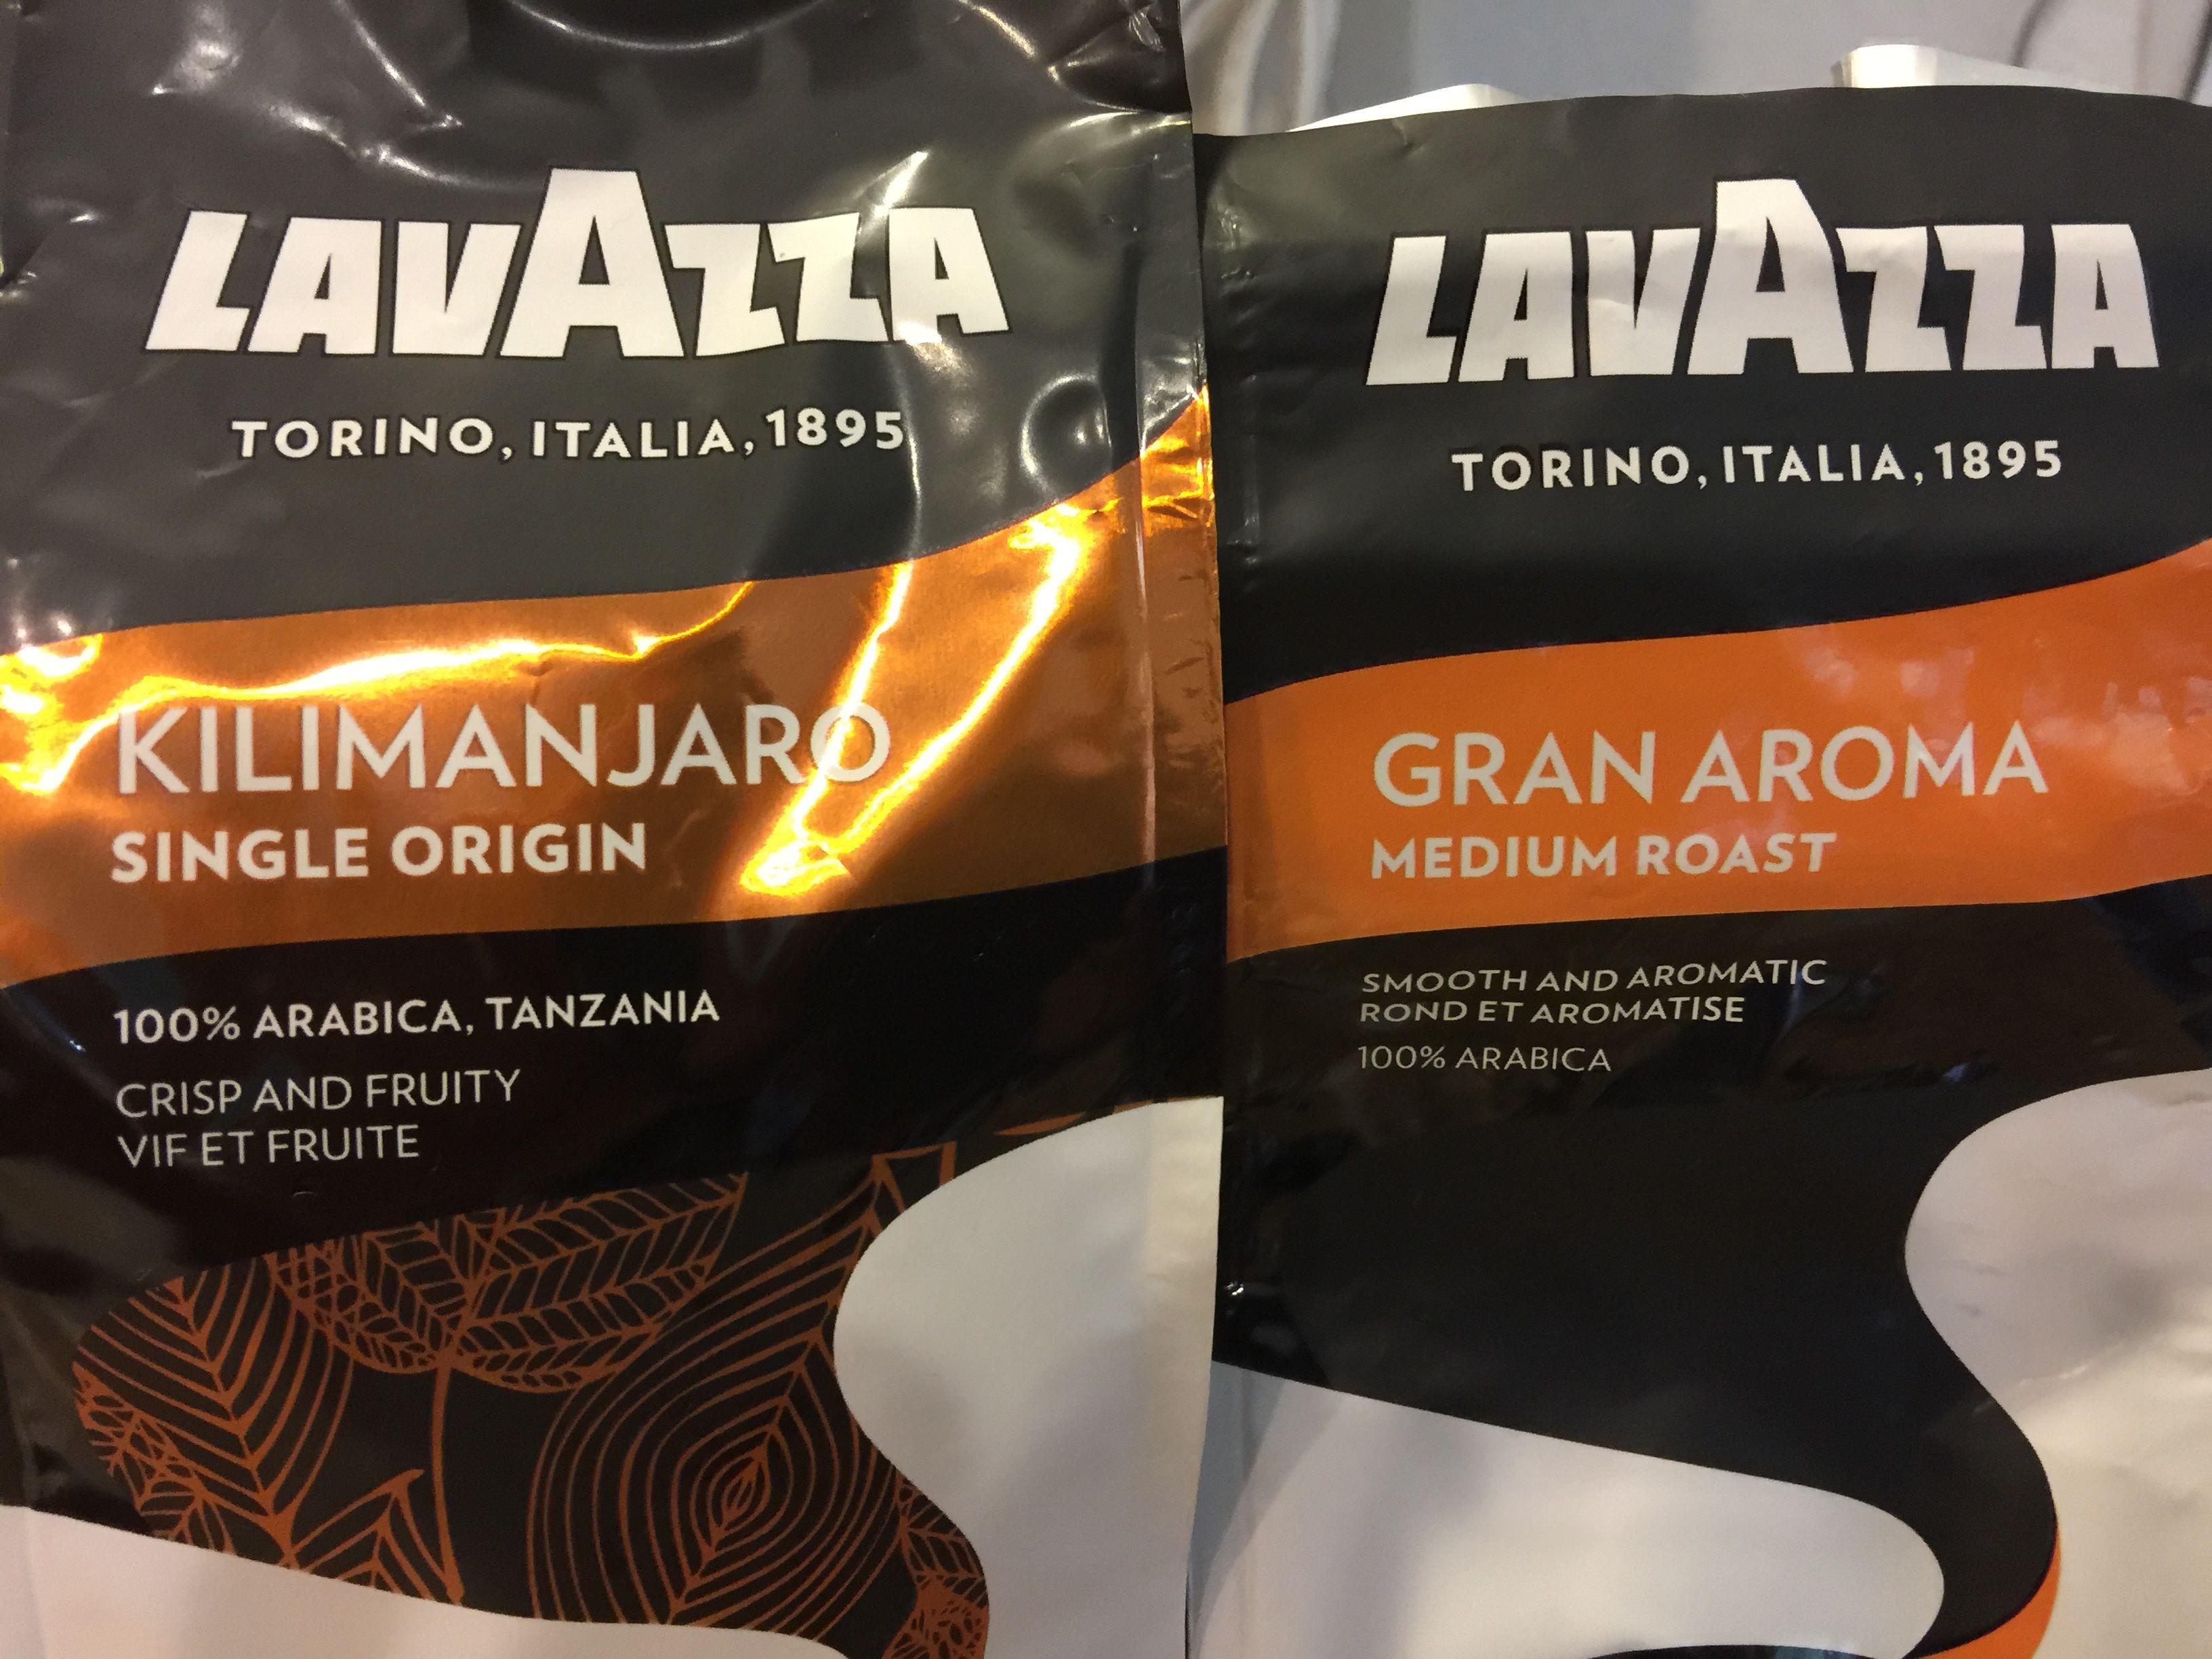 Lavazza ground coffee. Think I prefer the Gran Aroma